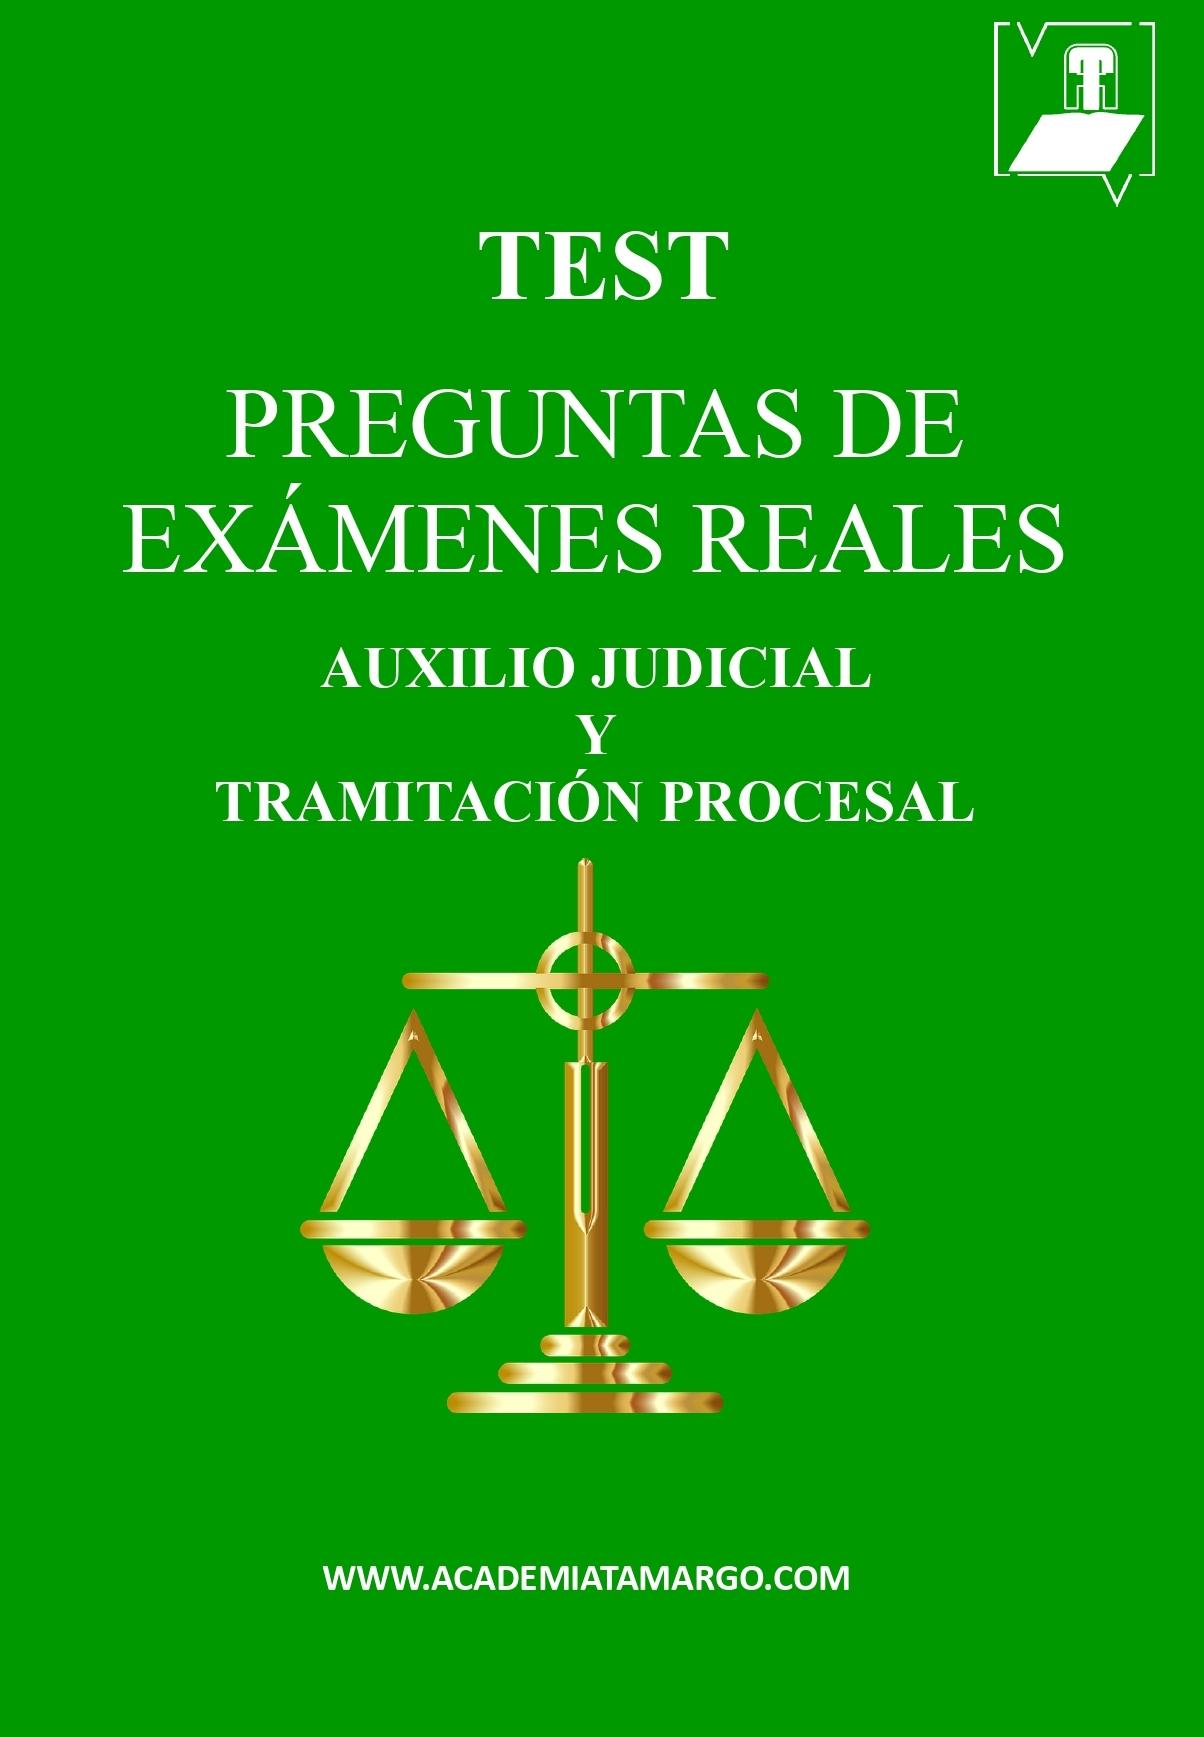 portada, contraportada auxilio judicial tramitación procesal FINAL_pages-to-jpg-0001